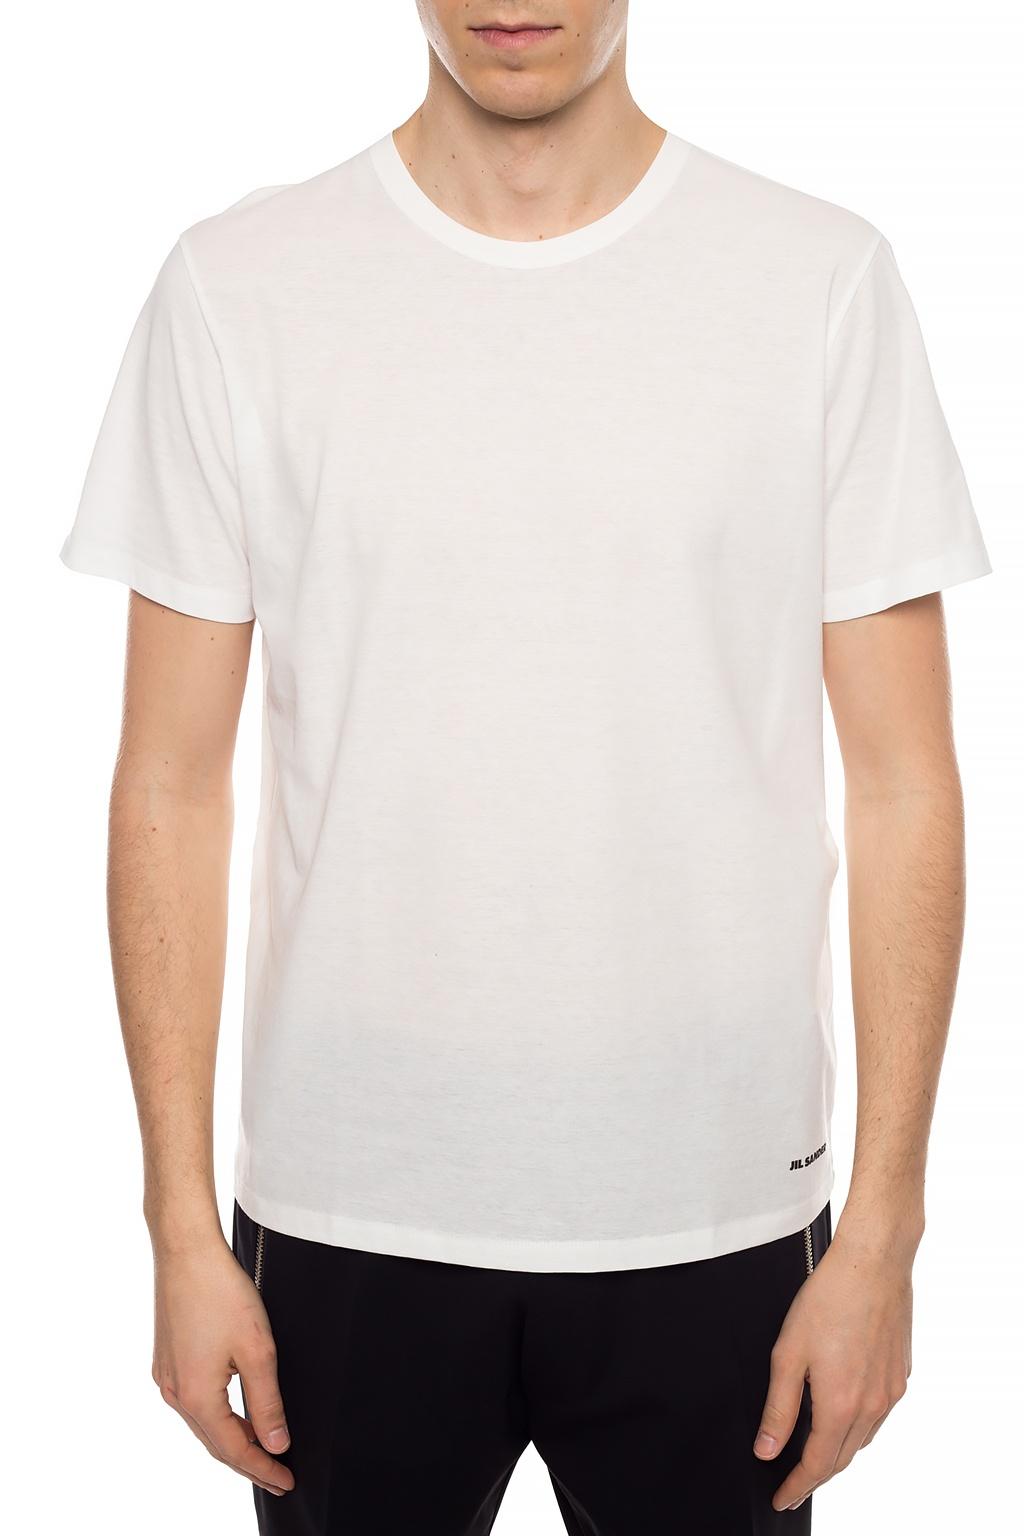 JIL SANDER+ Cotton t-shirt